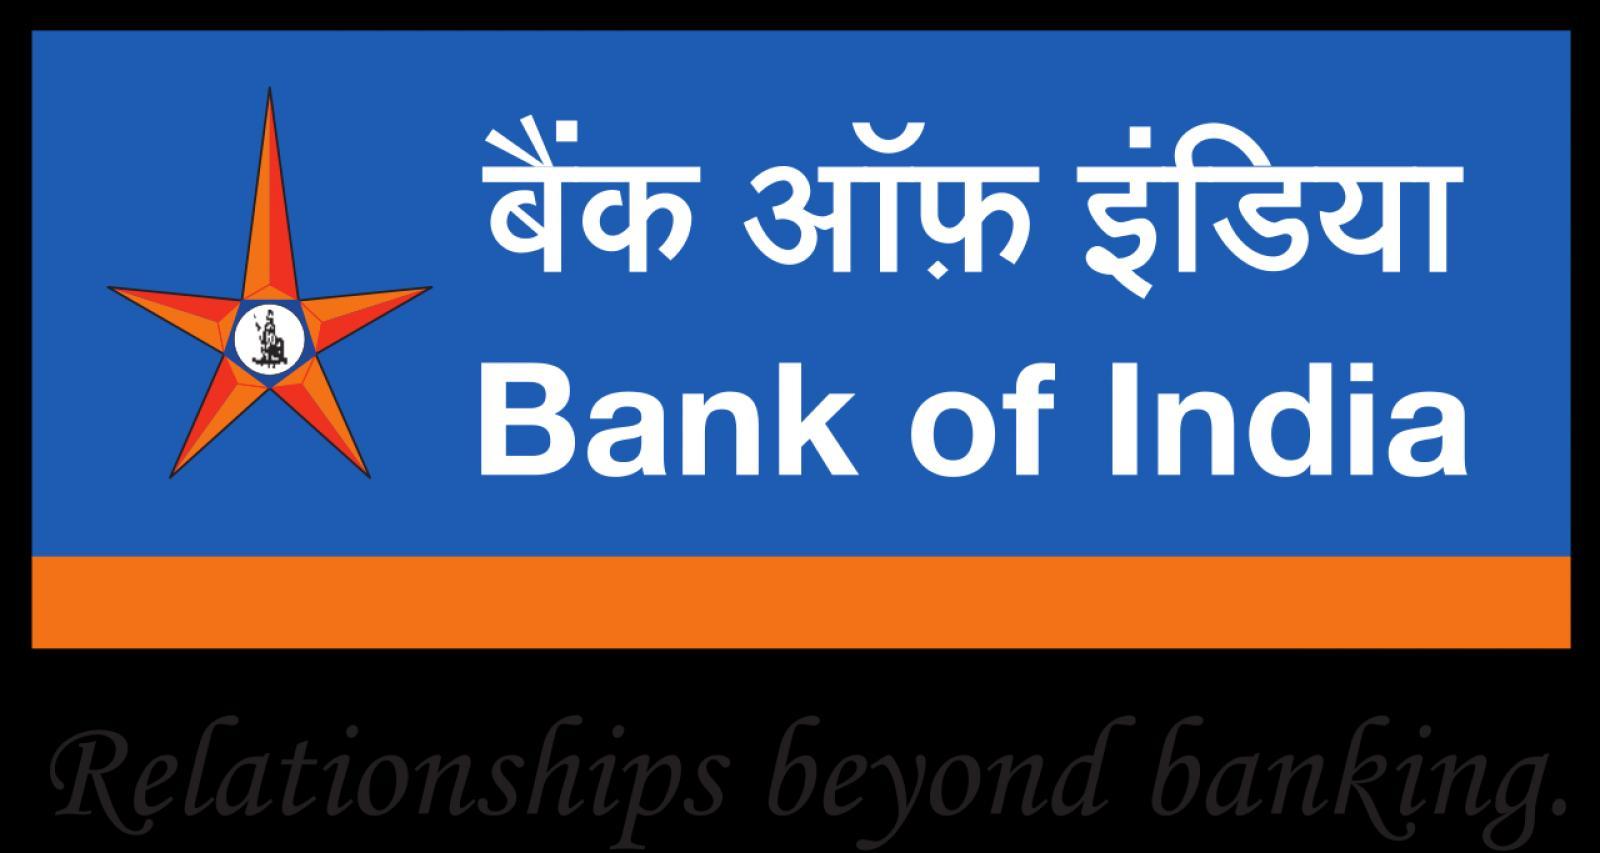 Bank Of India (boi)